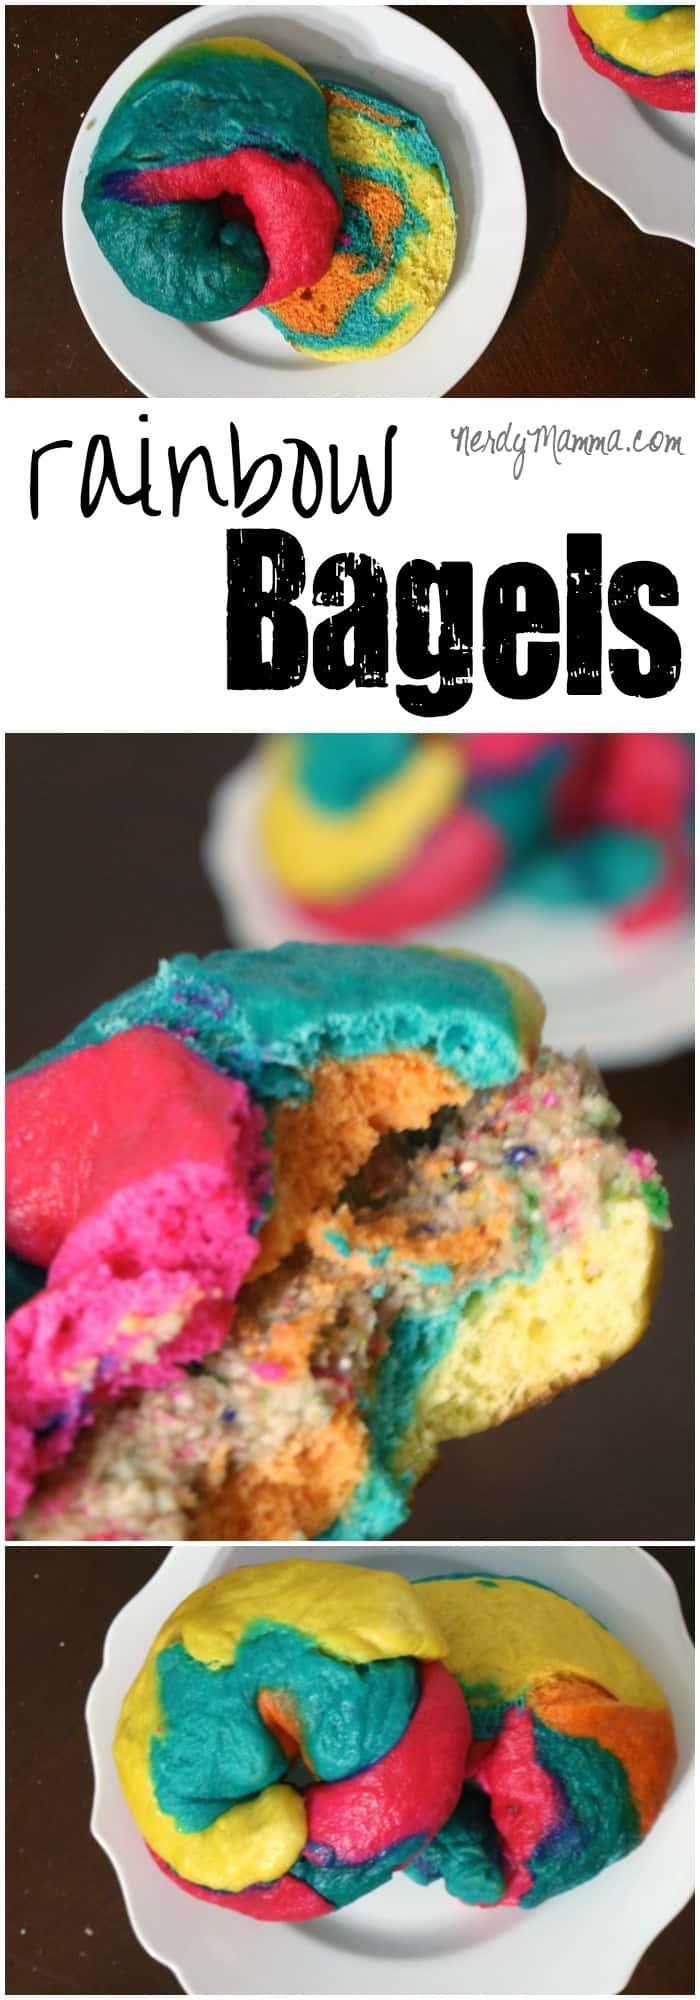 Welcome to the breakfast of unicorns. Rainbow bagels. Mmmmm...